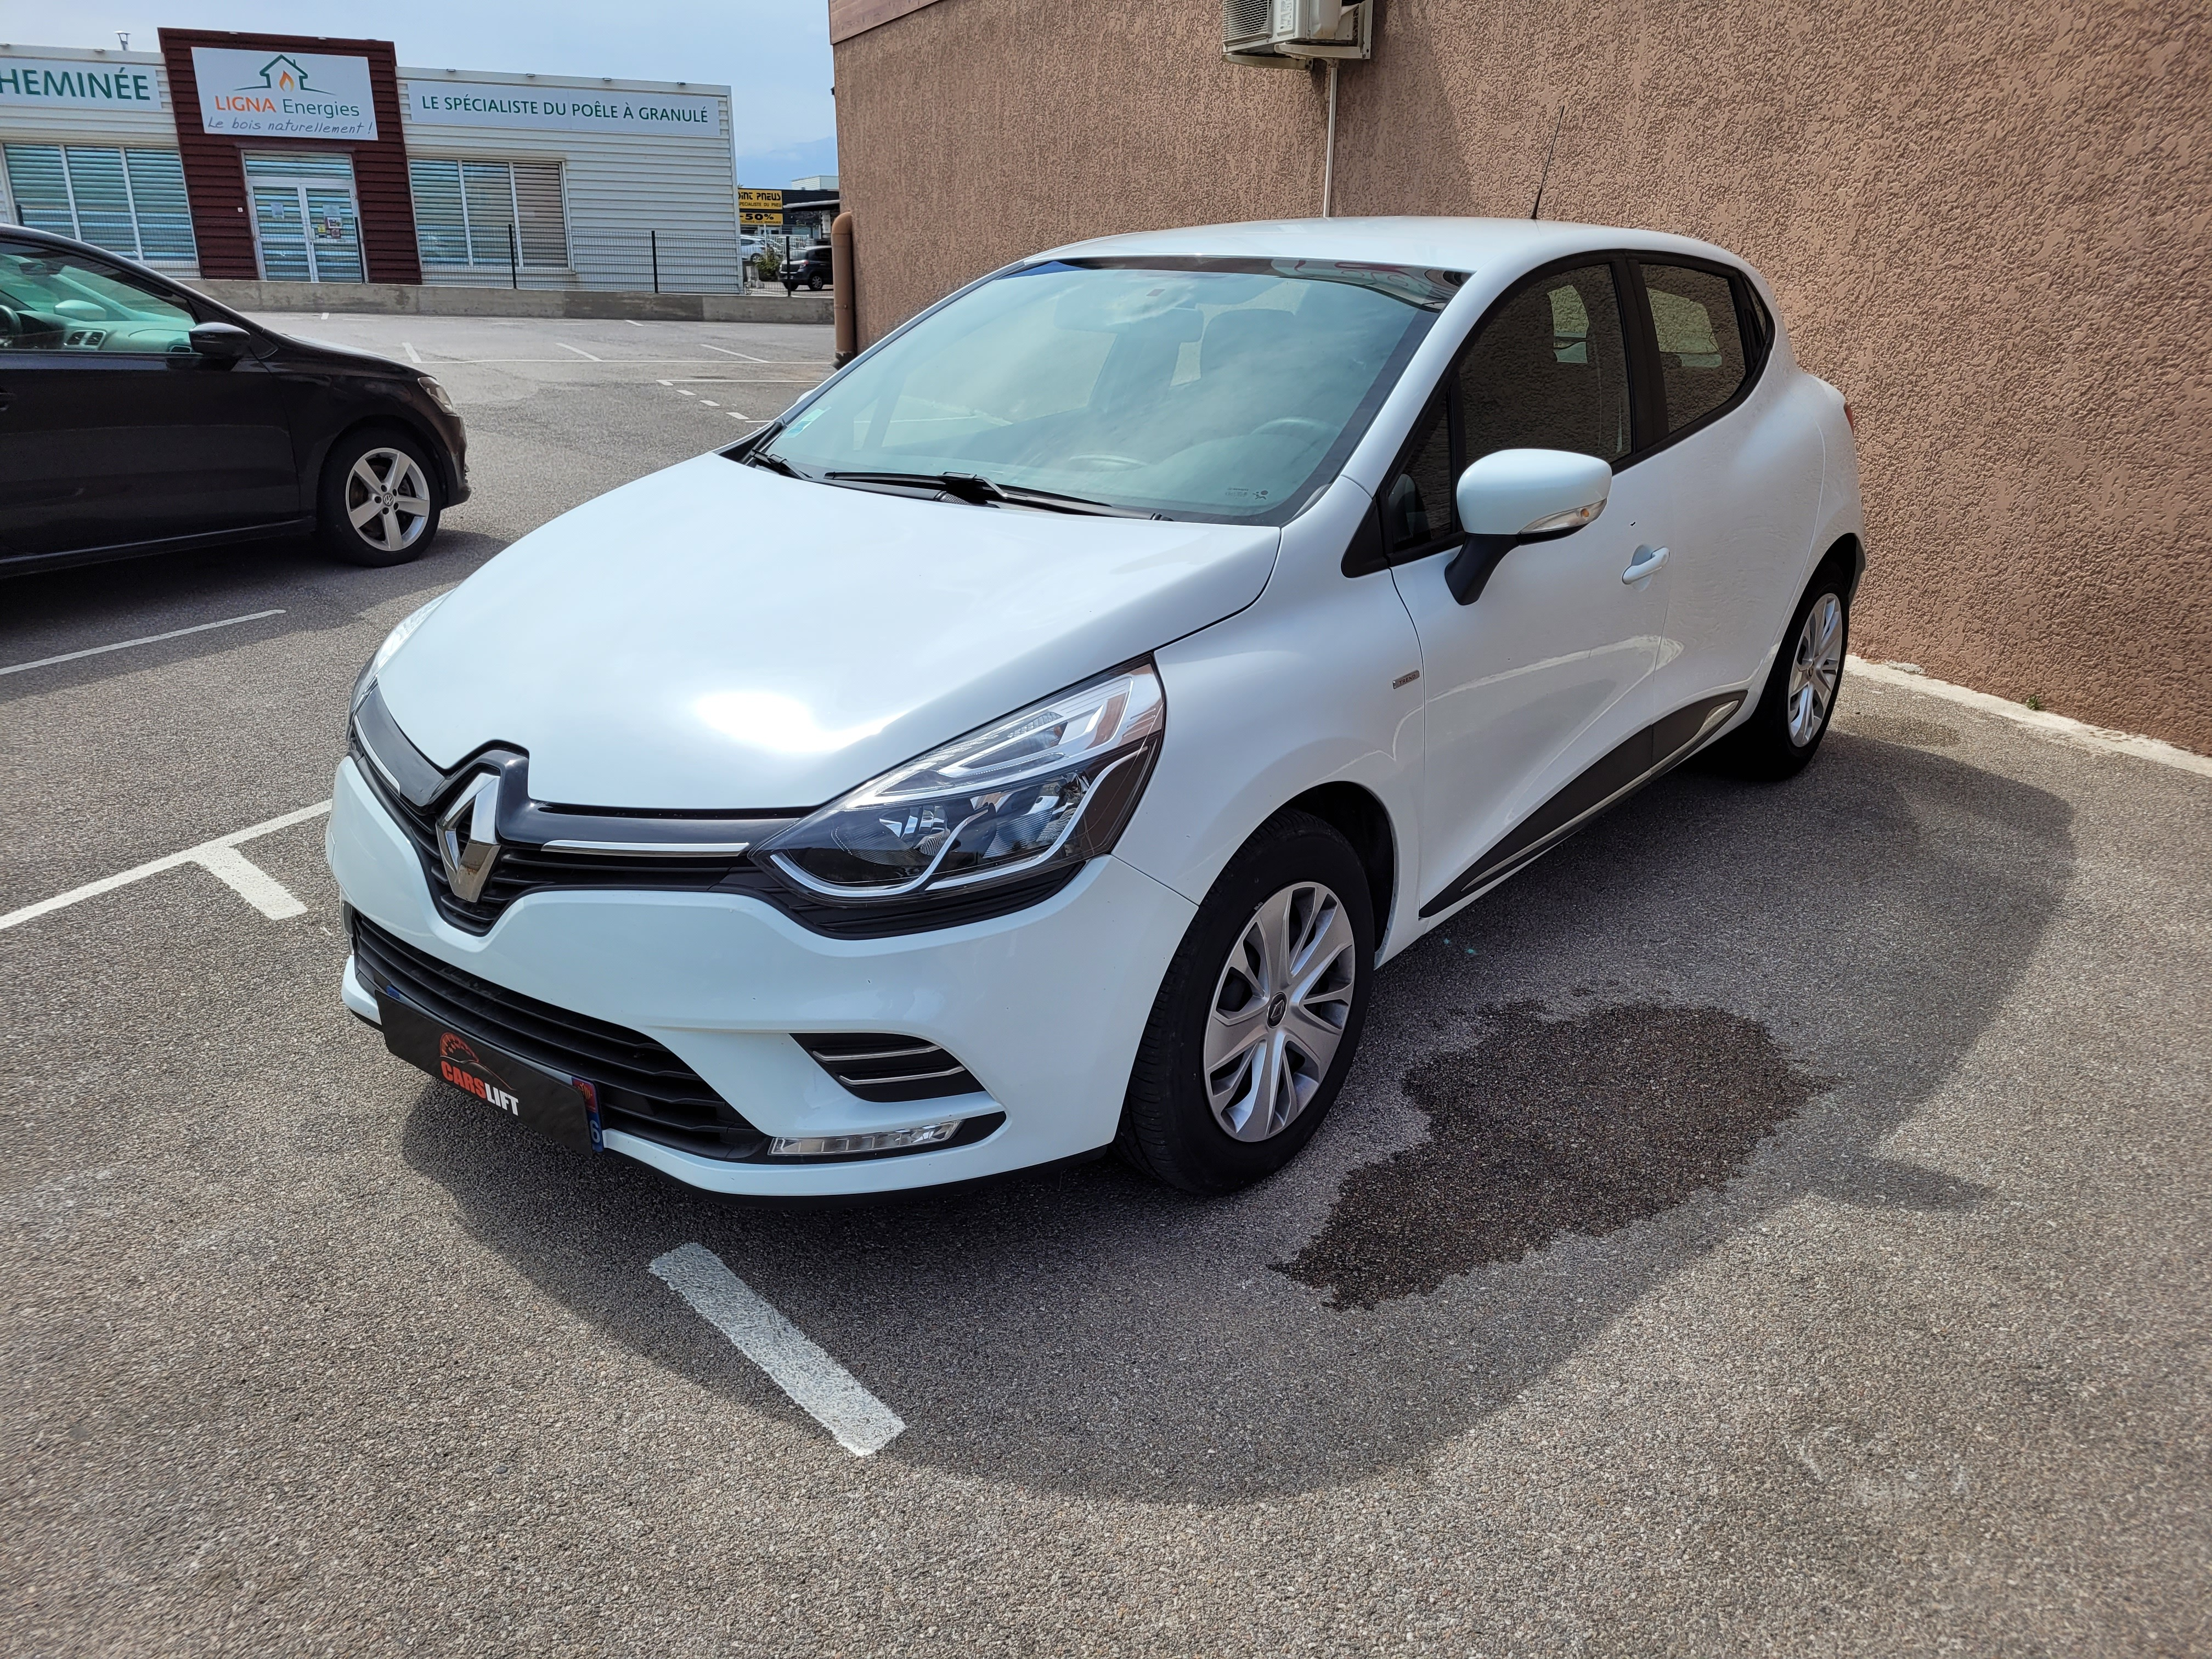 photo_Renault Clio IV TCe 75 E6C Trend,